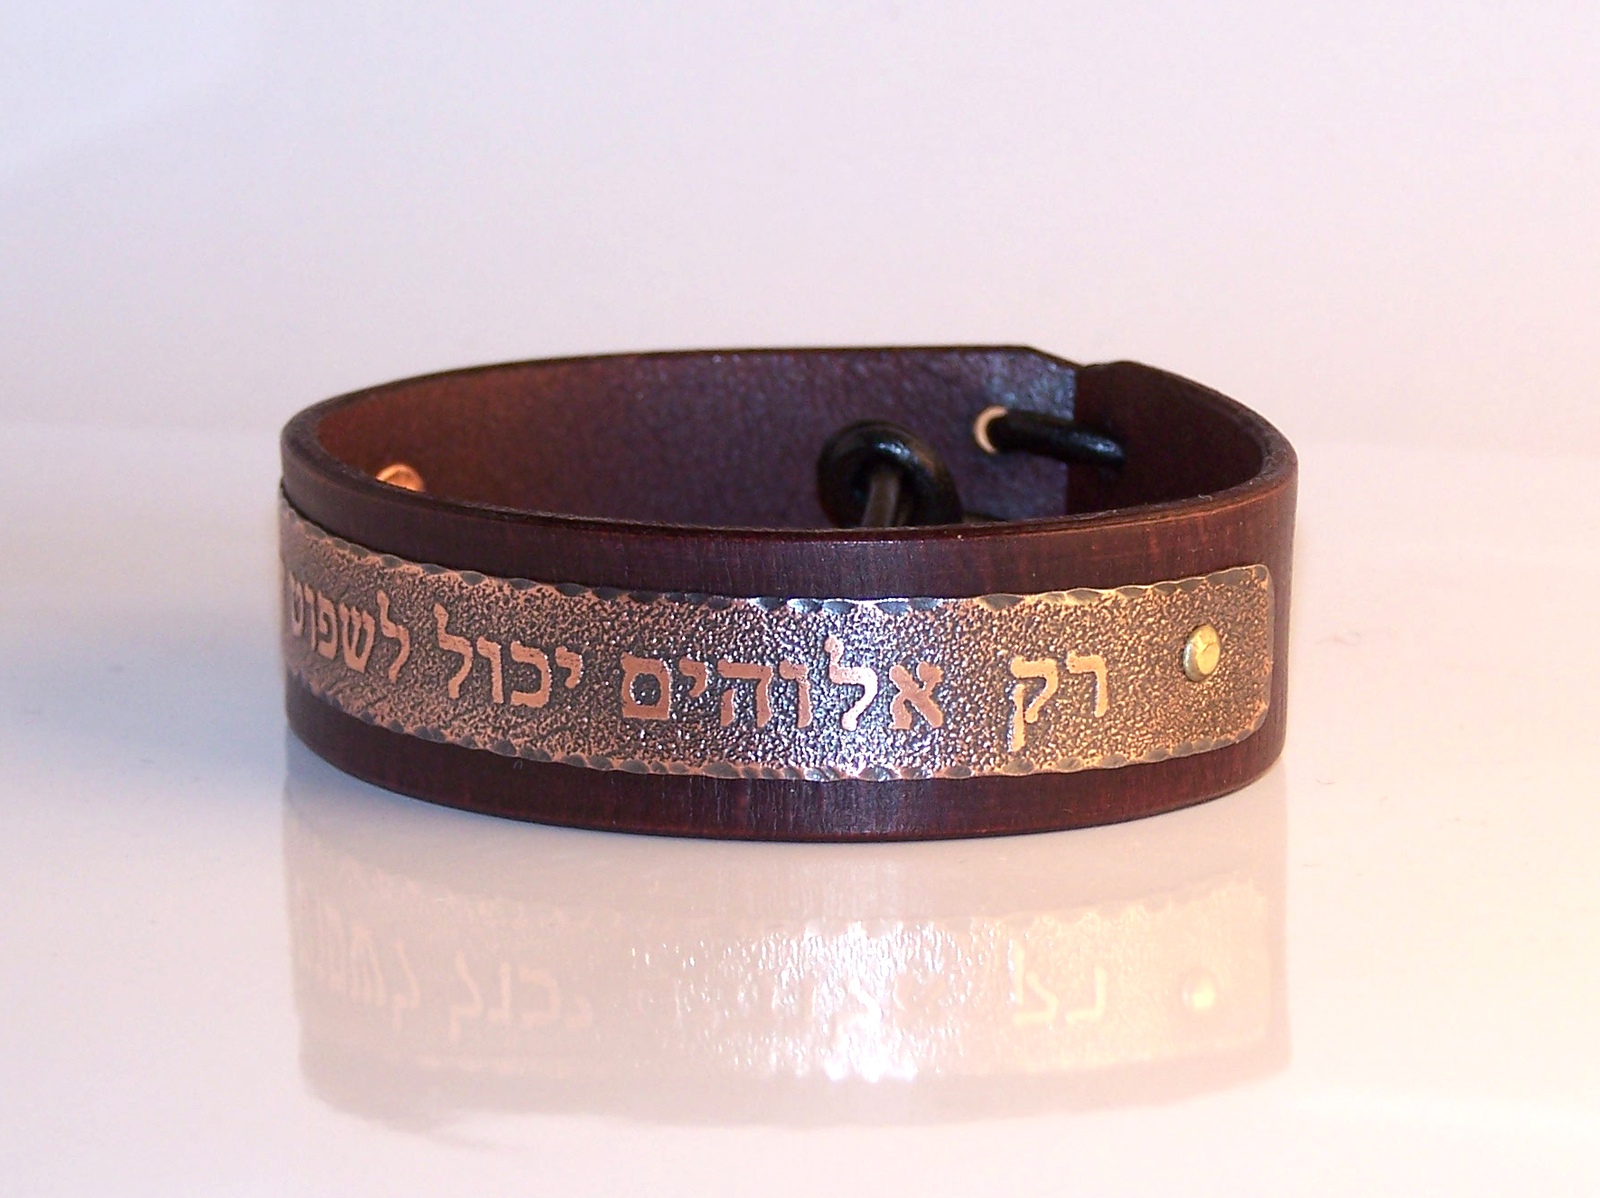 Only God can judge me - Mens leather cuff bracelet, hebrew inscription image 2